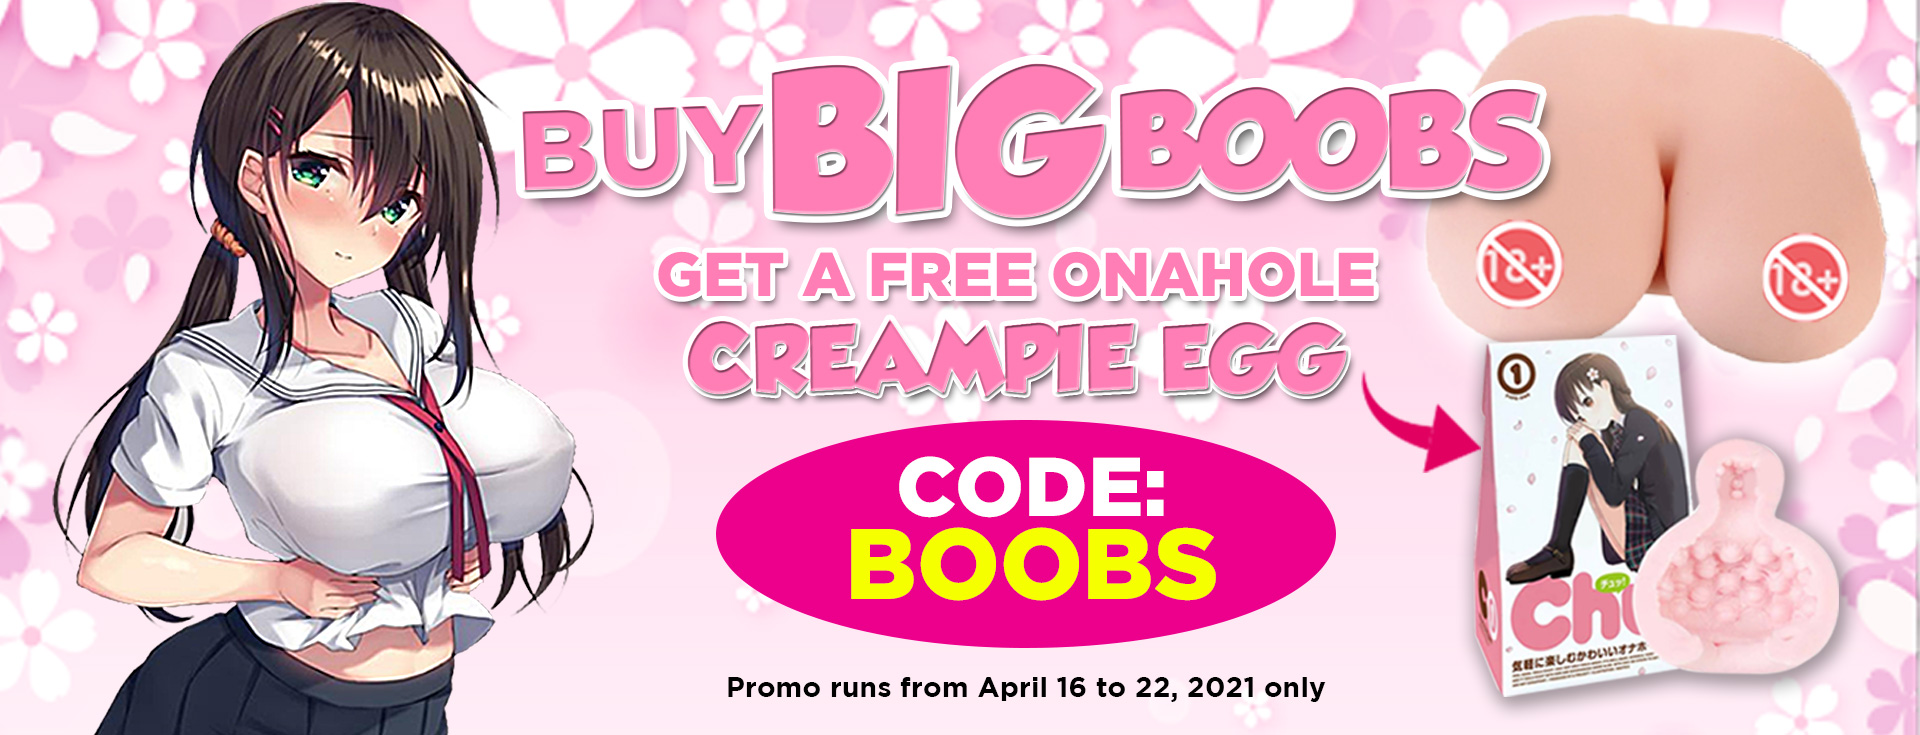 buy-big-boobs-get-a-free-creampie-egg-carousel.jpg